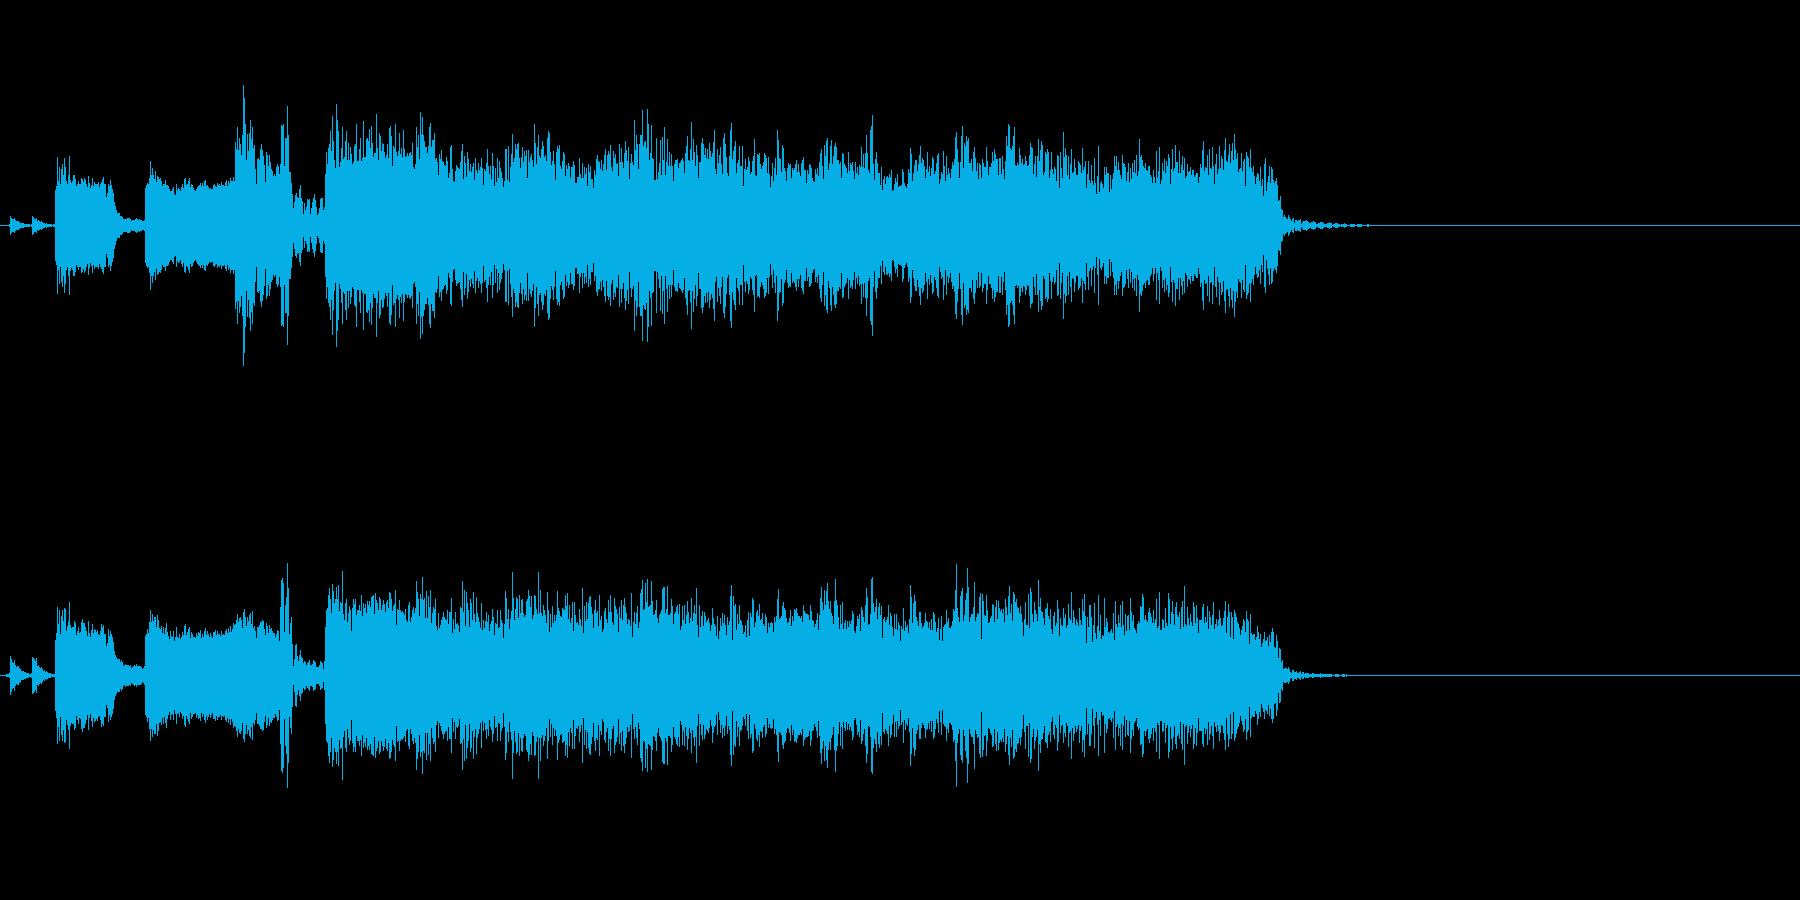 TVラジオ放送用。ロックアップテンポの再生済みの波形